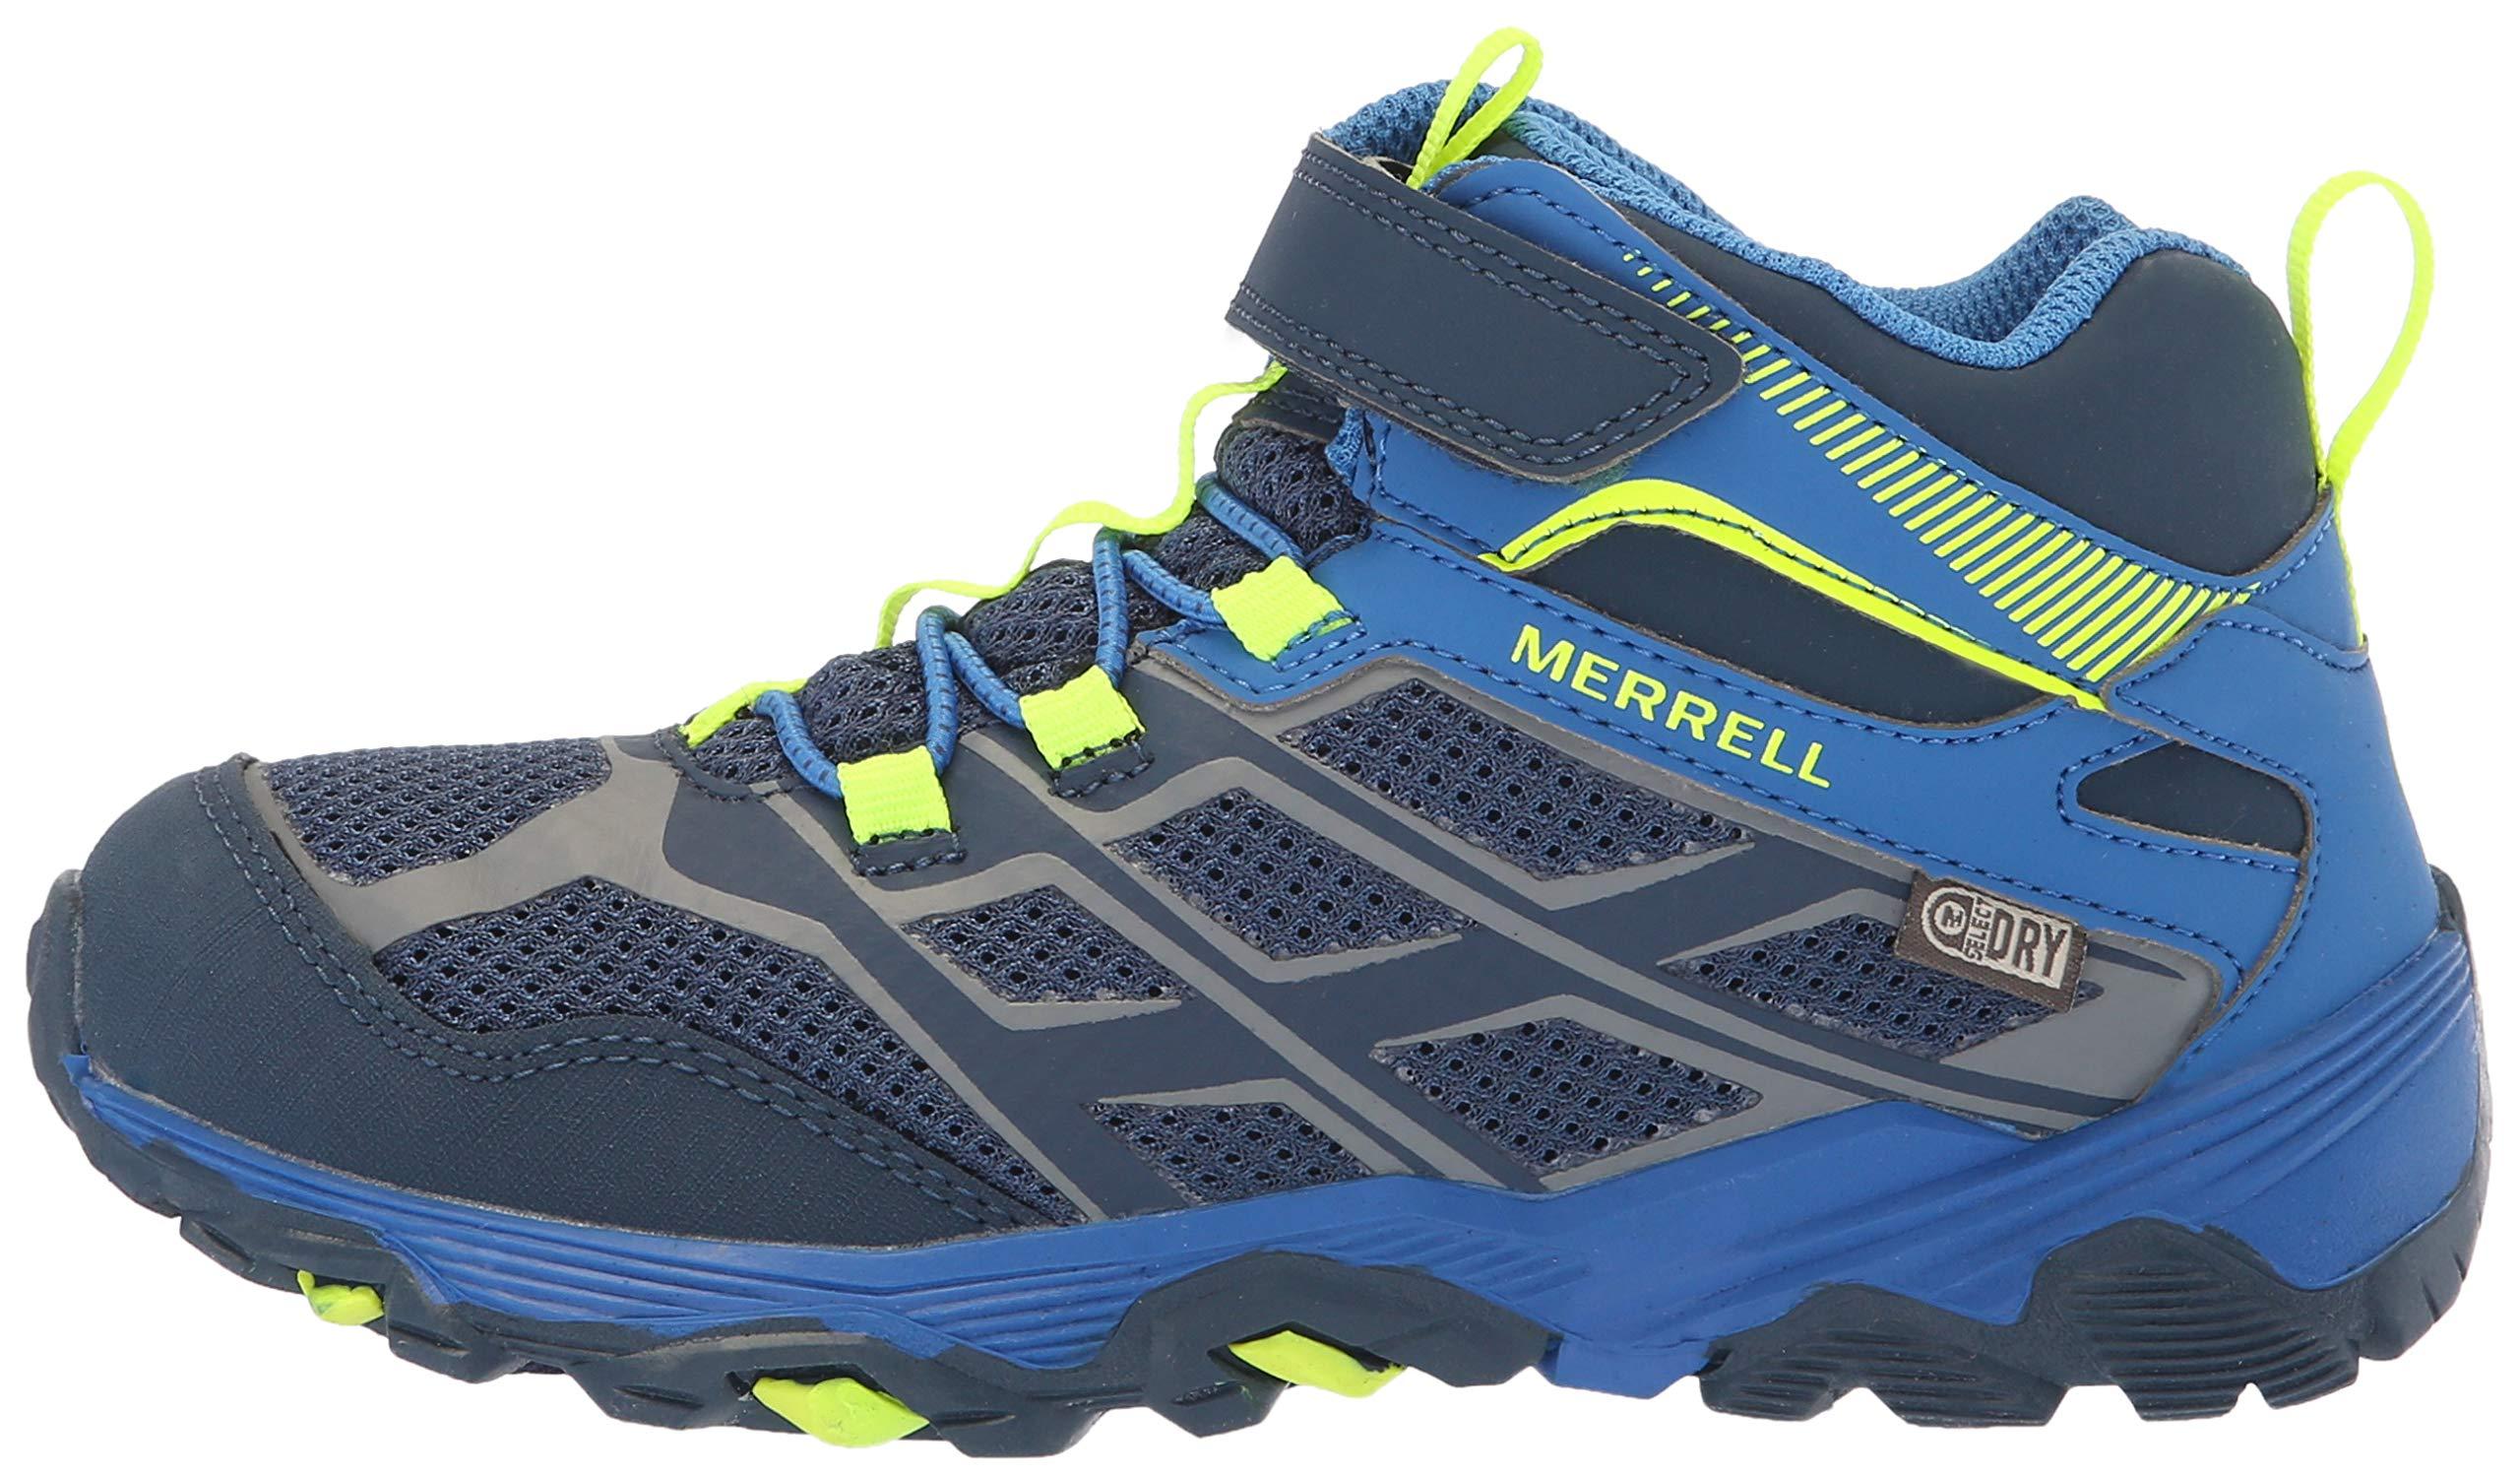 Merrell Boys' Moab FST Mid A/C WTRPF Hiking Shoe, Navy/Cobalt, 6 Medium US Big Kid by Merrell (Image #5)